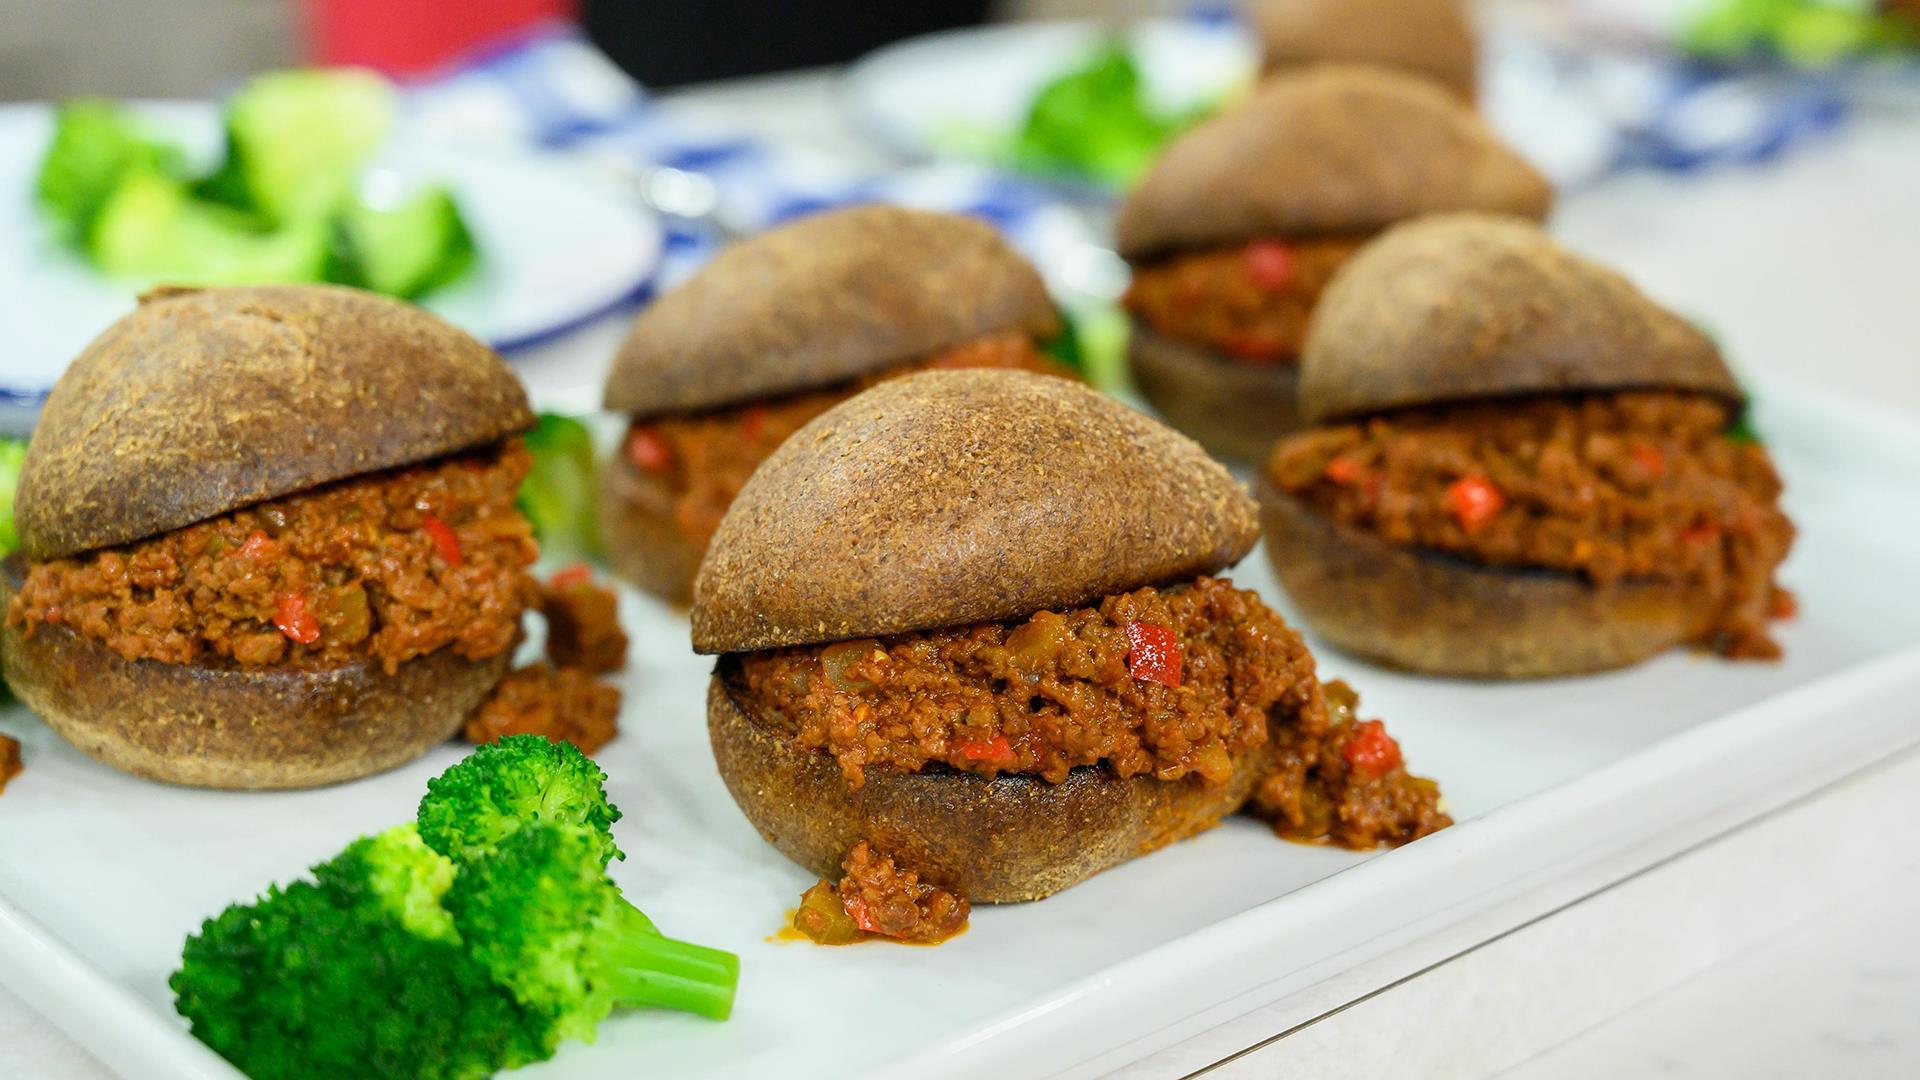 Image result for Al Roker makes his favorite 'no-recipe' sloppy Joes on keto-friendly bread